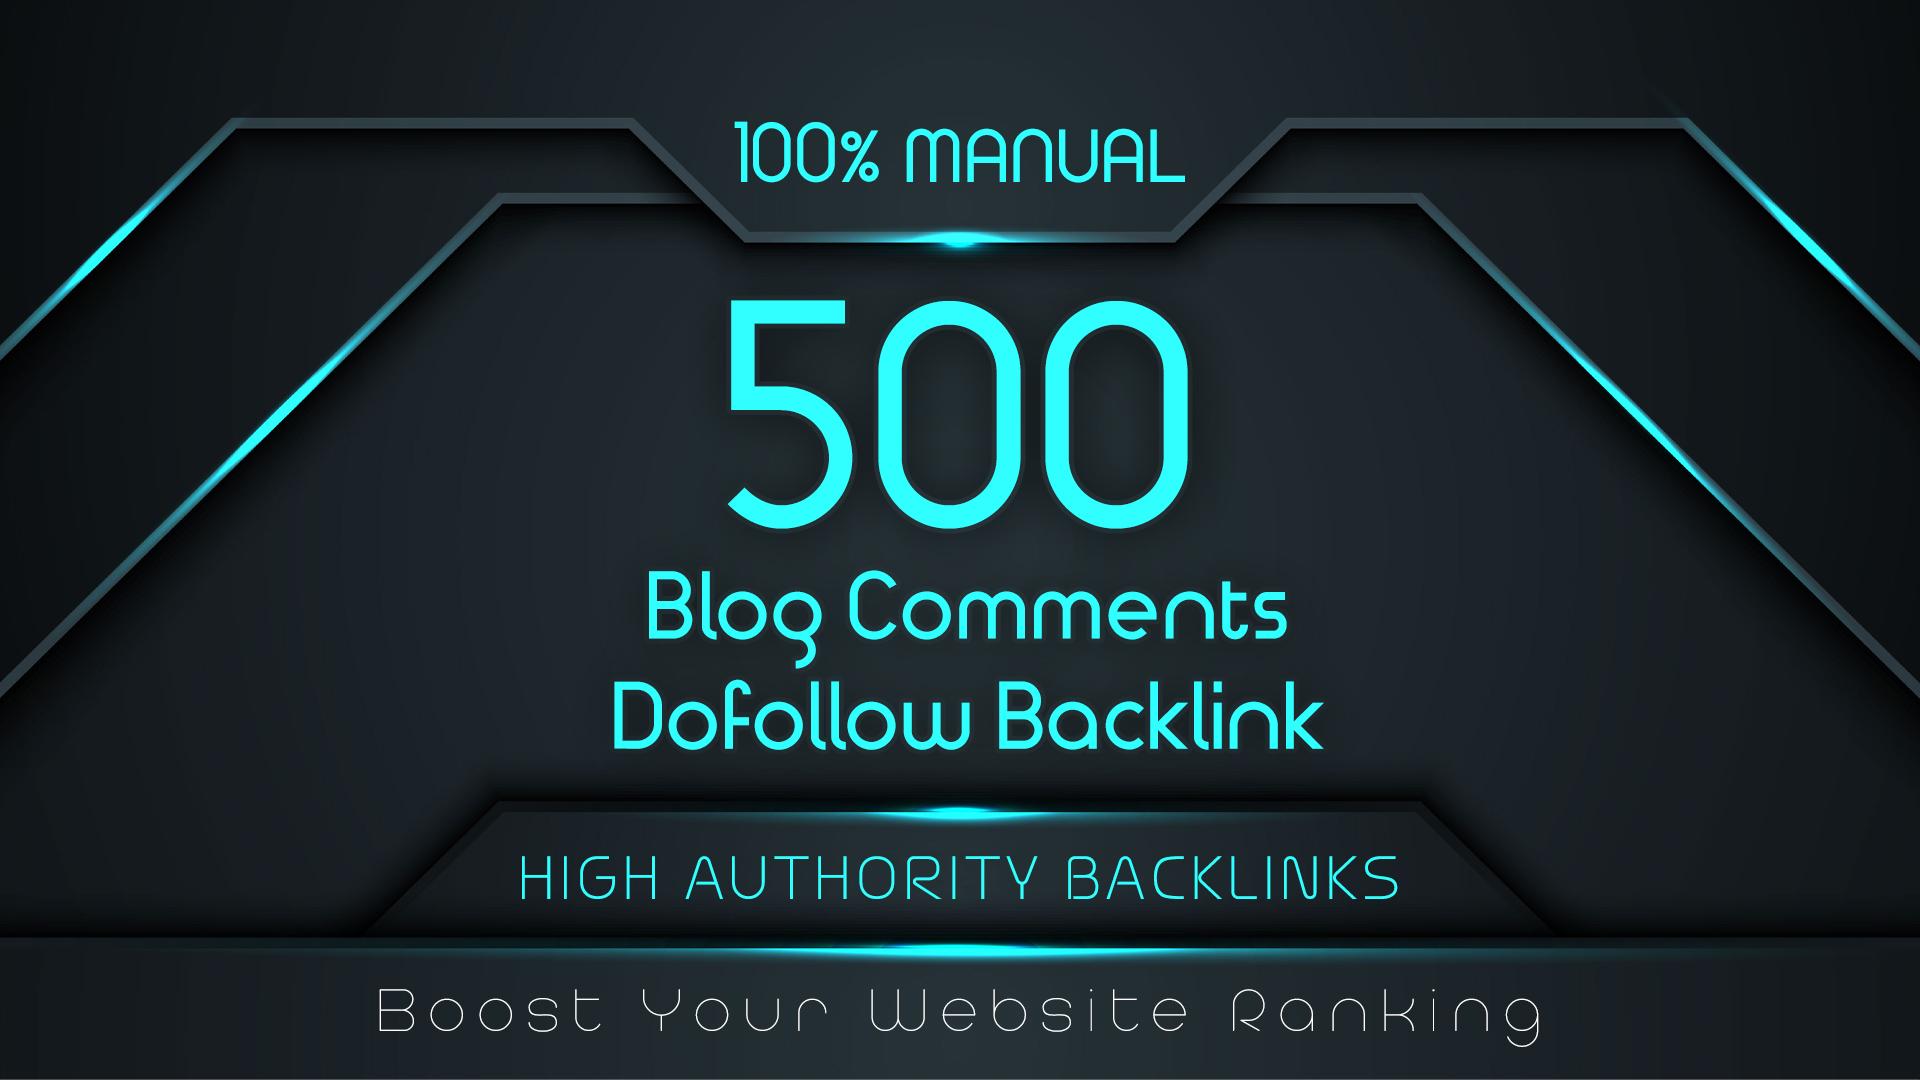 Create Manual 500 Dofollow Blog Comments Backlinks On High DA-PA